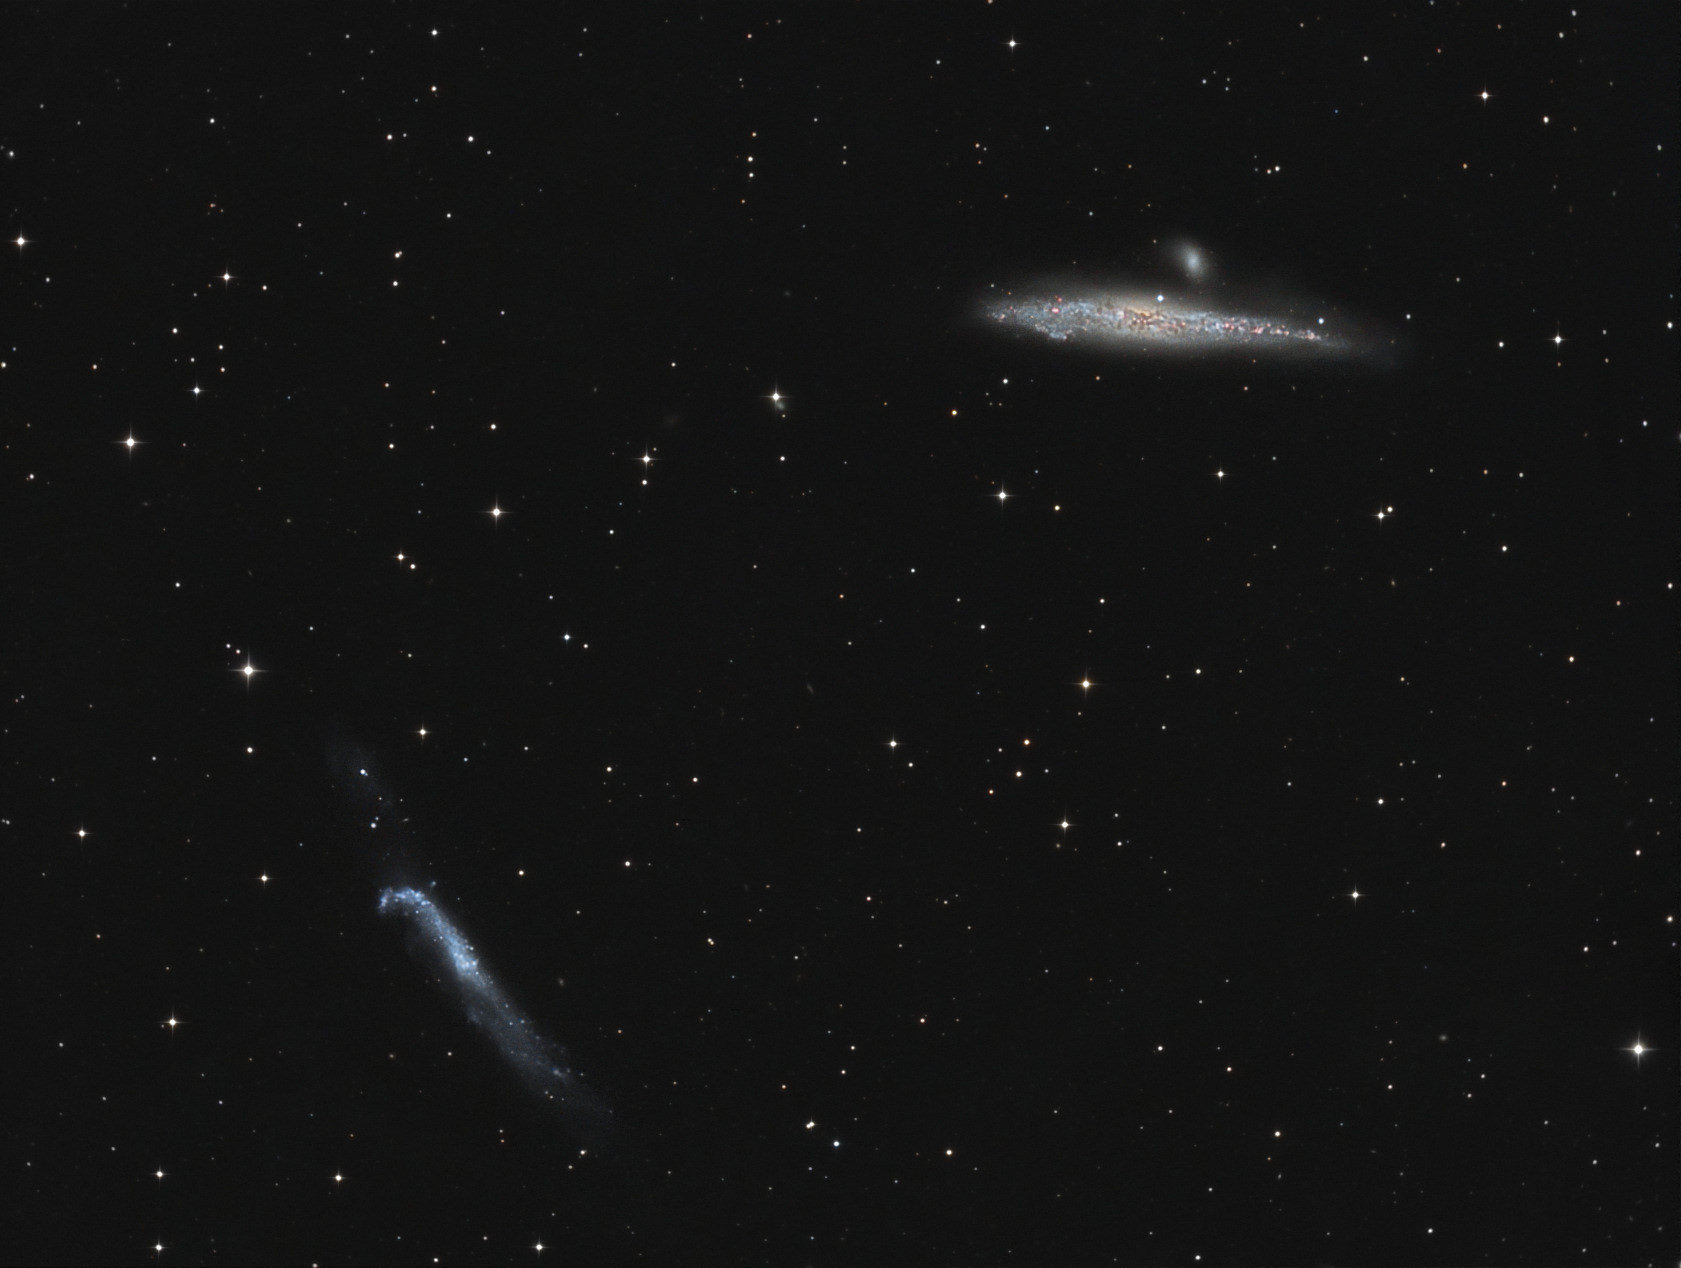 http://www.astrosurf.com/micastro/images/NGC4656-4631.jpg